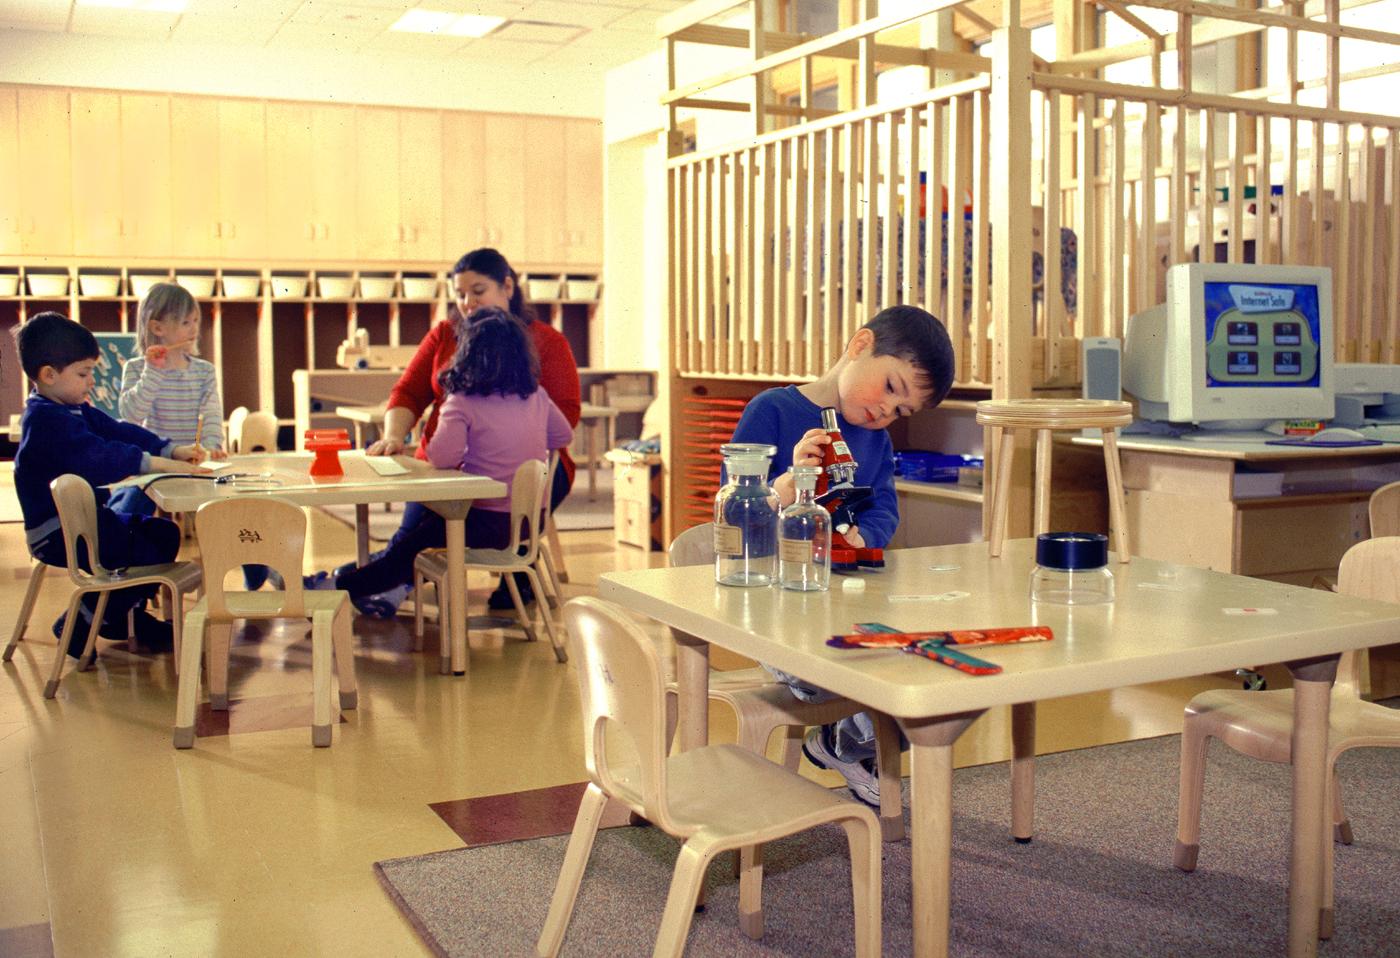 01.5_phopro-int-preschool room science-200ppi-7x5.jpg